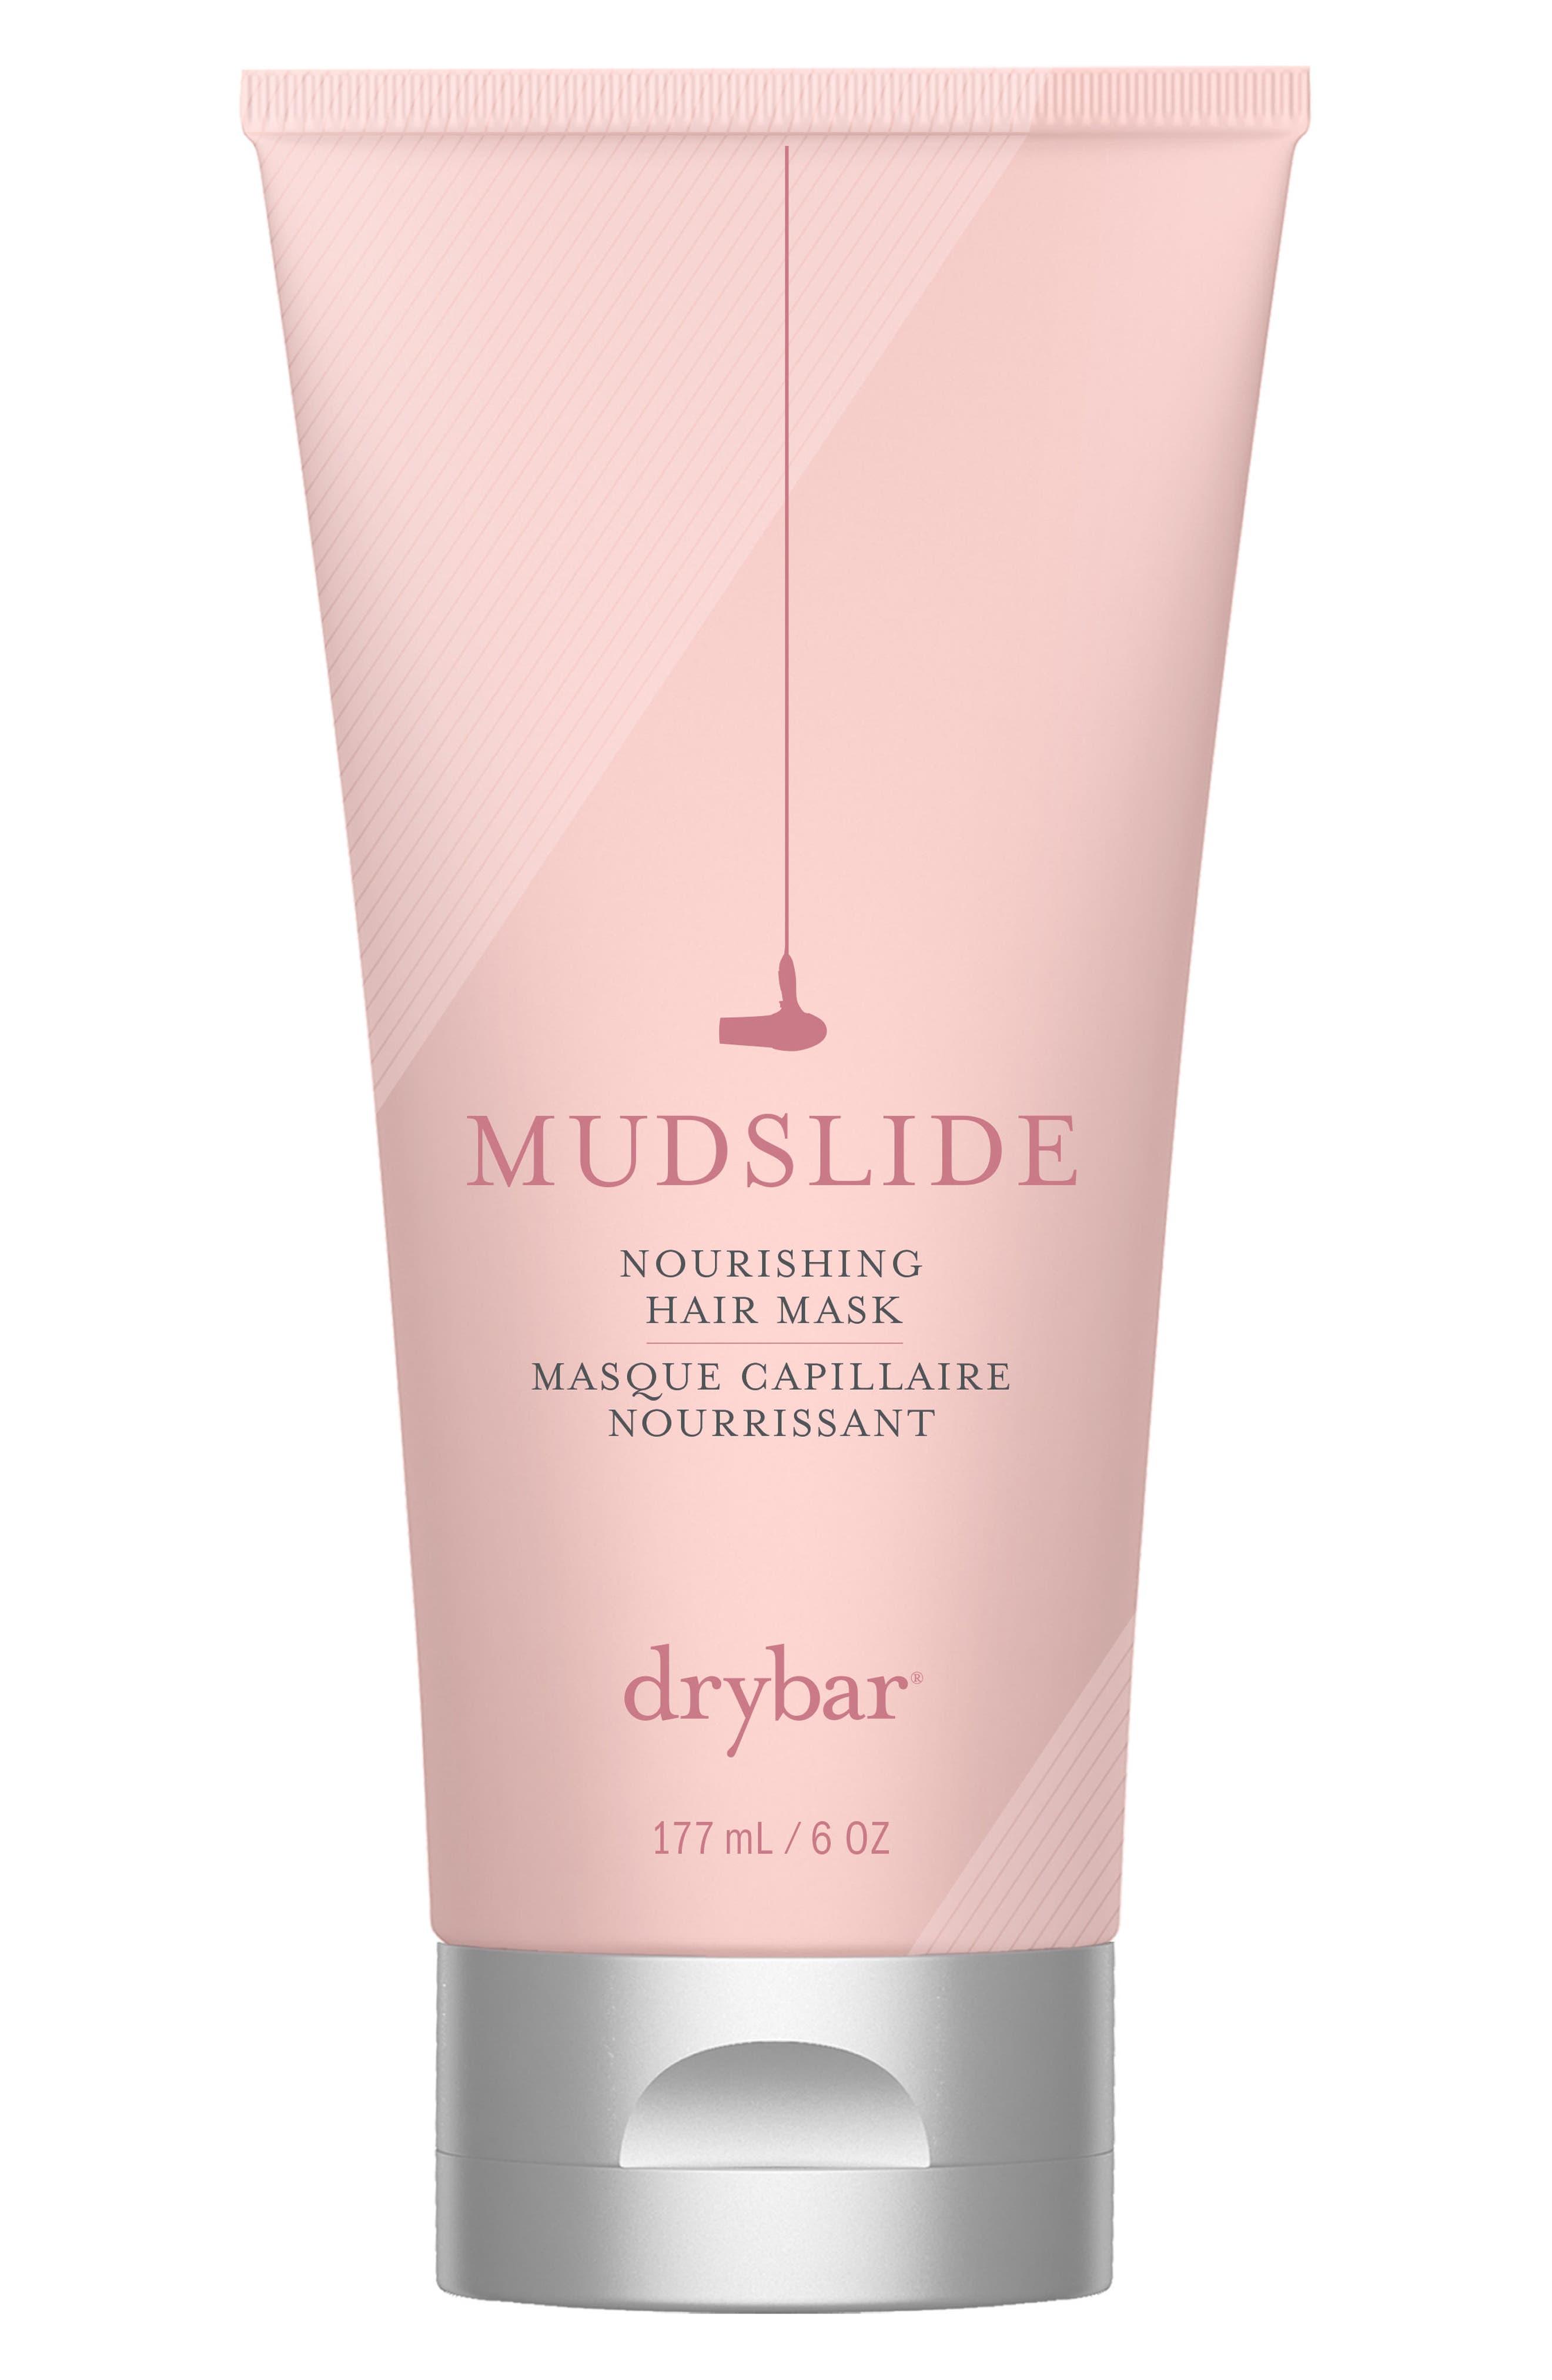 Mudslide Nourishing Hair Mask,                         Main,                         color, No Color